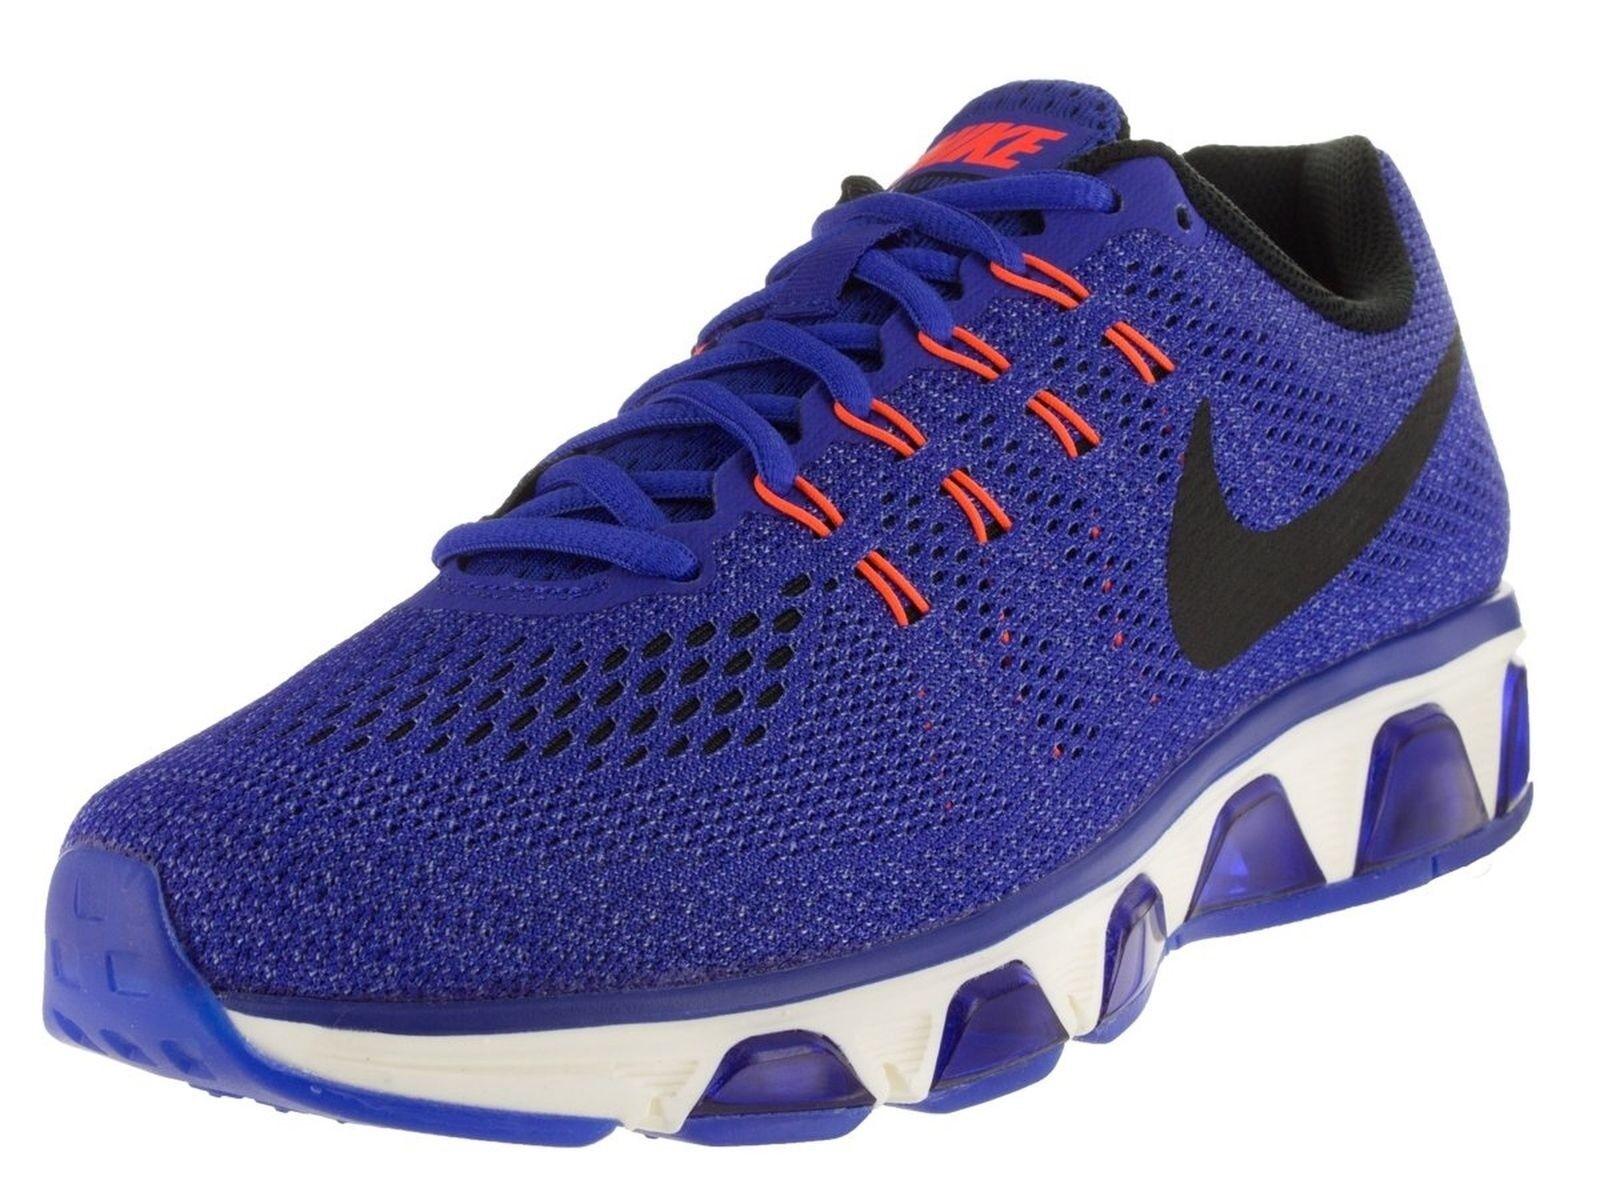 Nike Womens Air Max Tailwind 8 Black/White/Anthracite Running Shoe